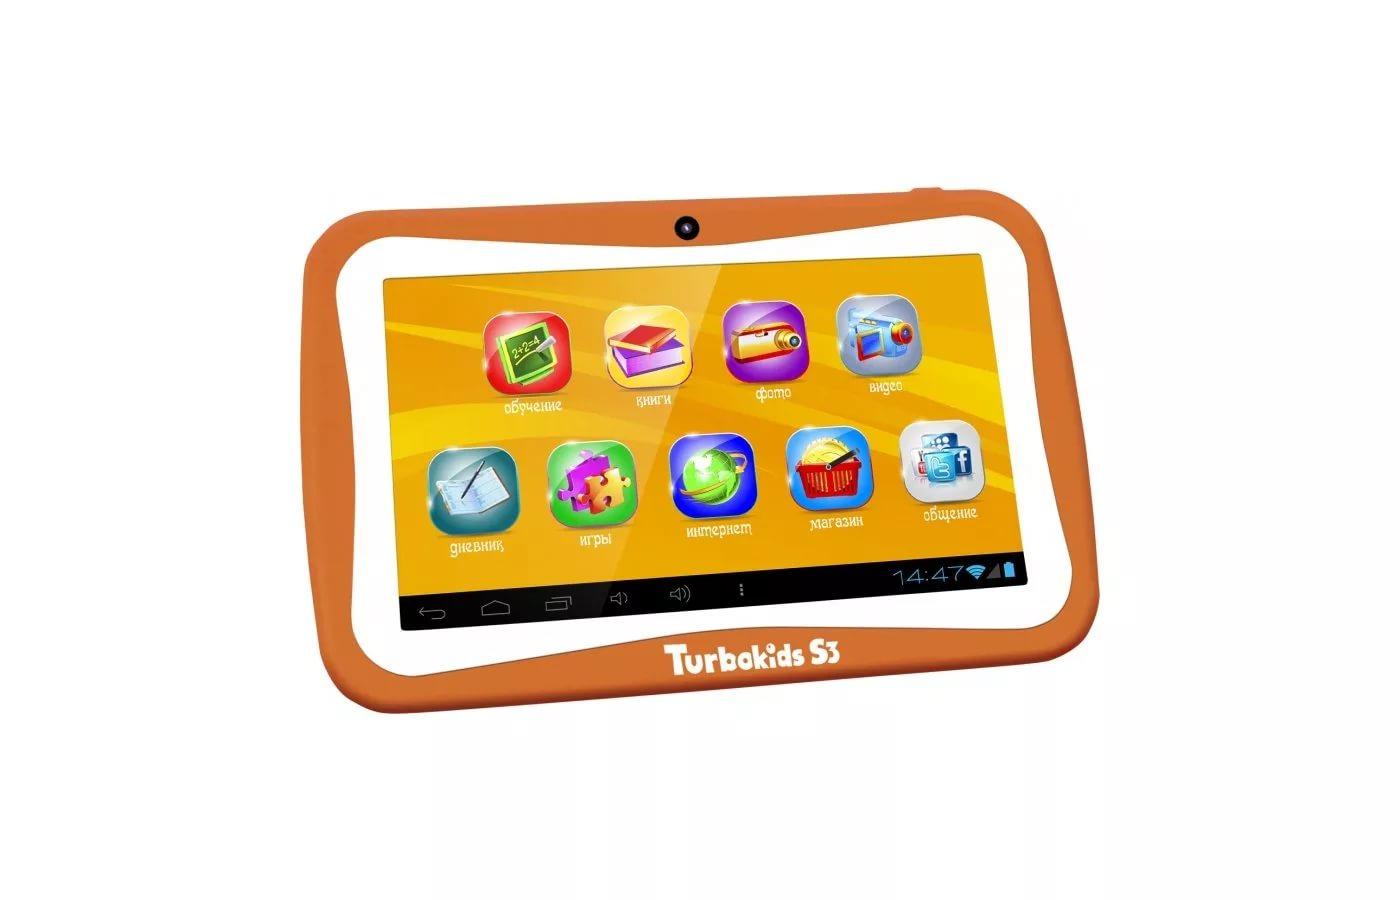 игровые приставки TurboKids